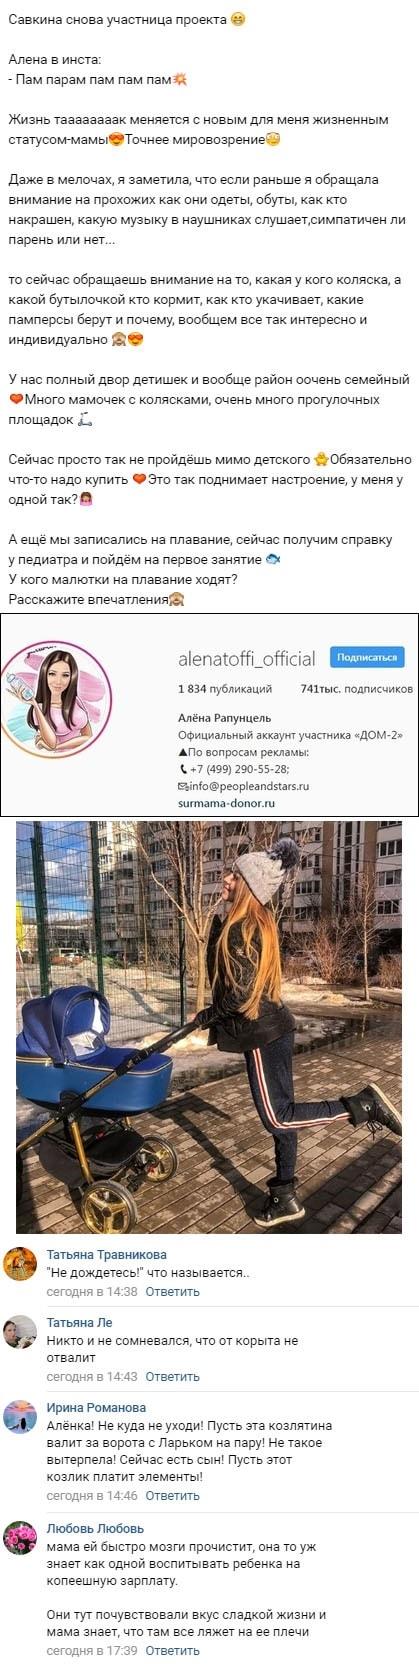 Алена Савкина приняла решение вернуться на проект